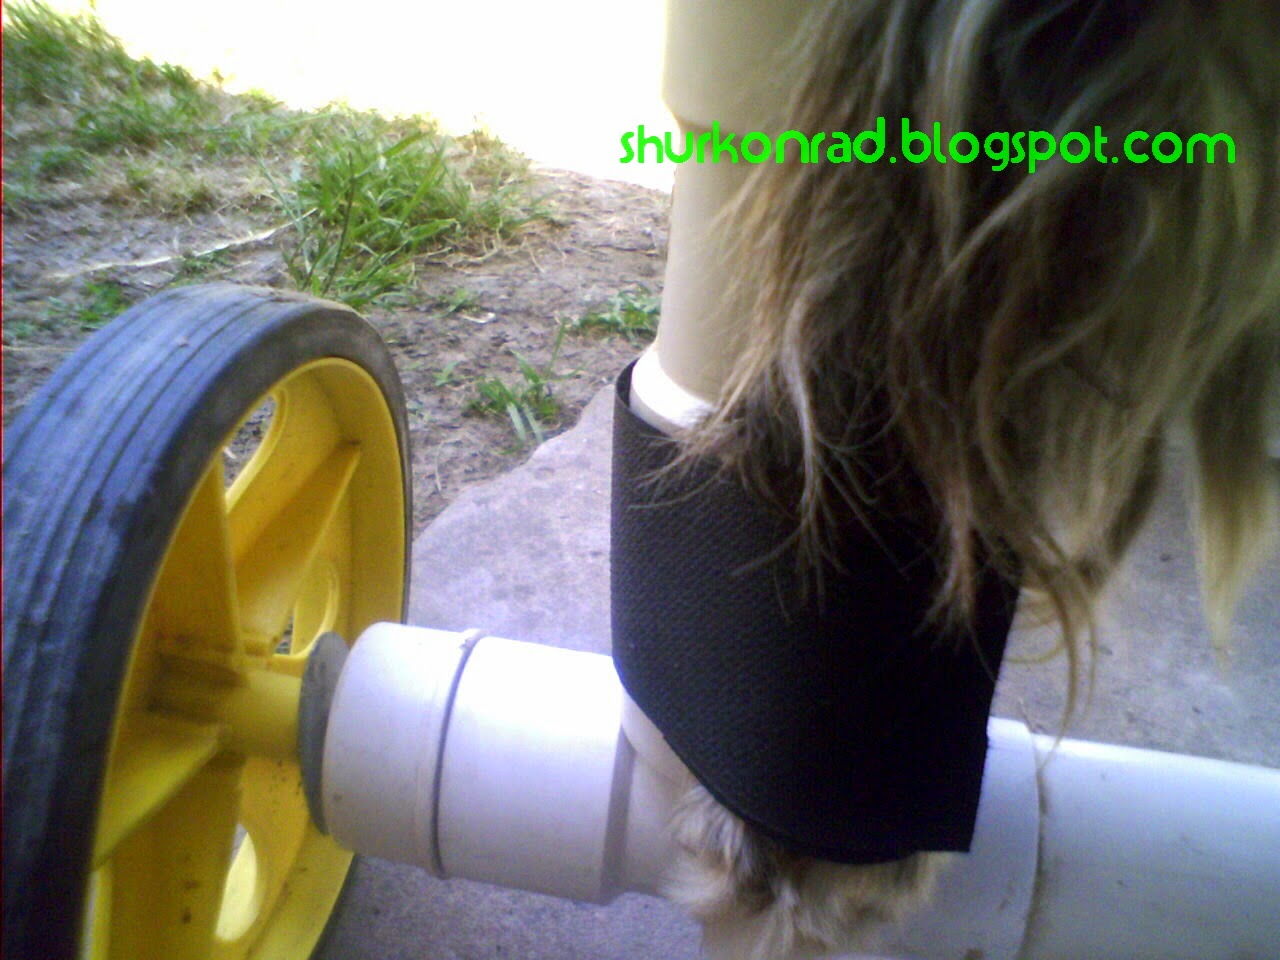 ShurKonrad perro silla ruedas dog 28